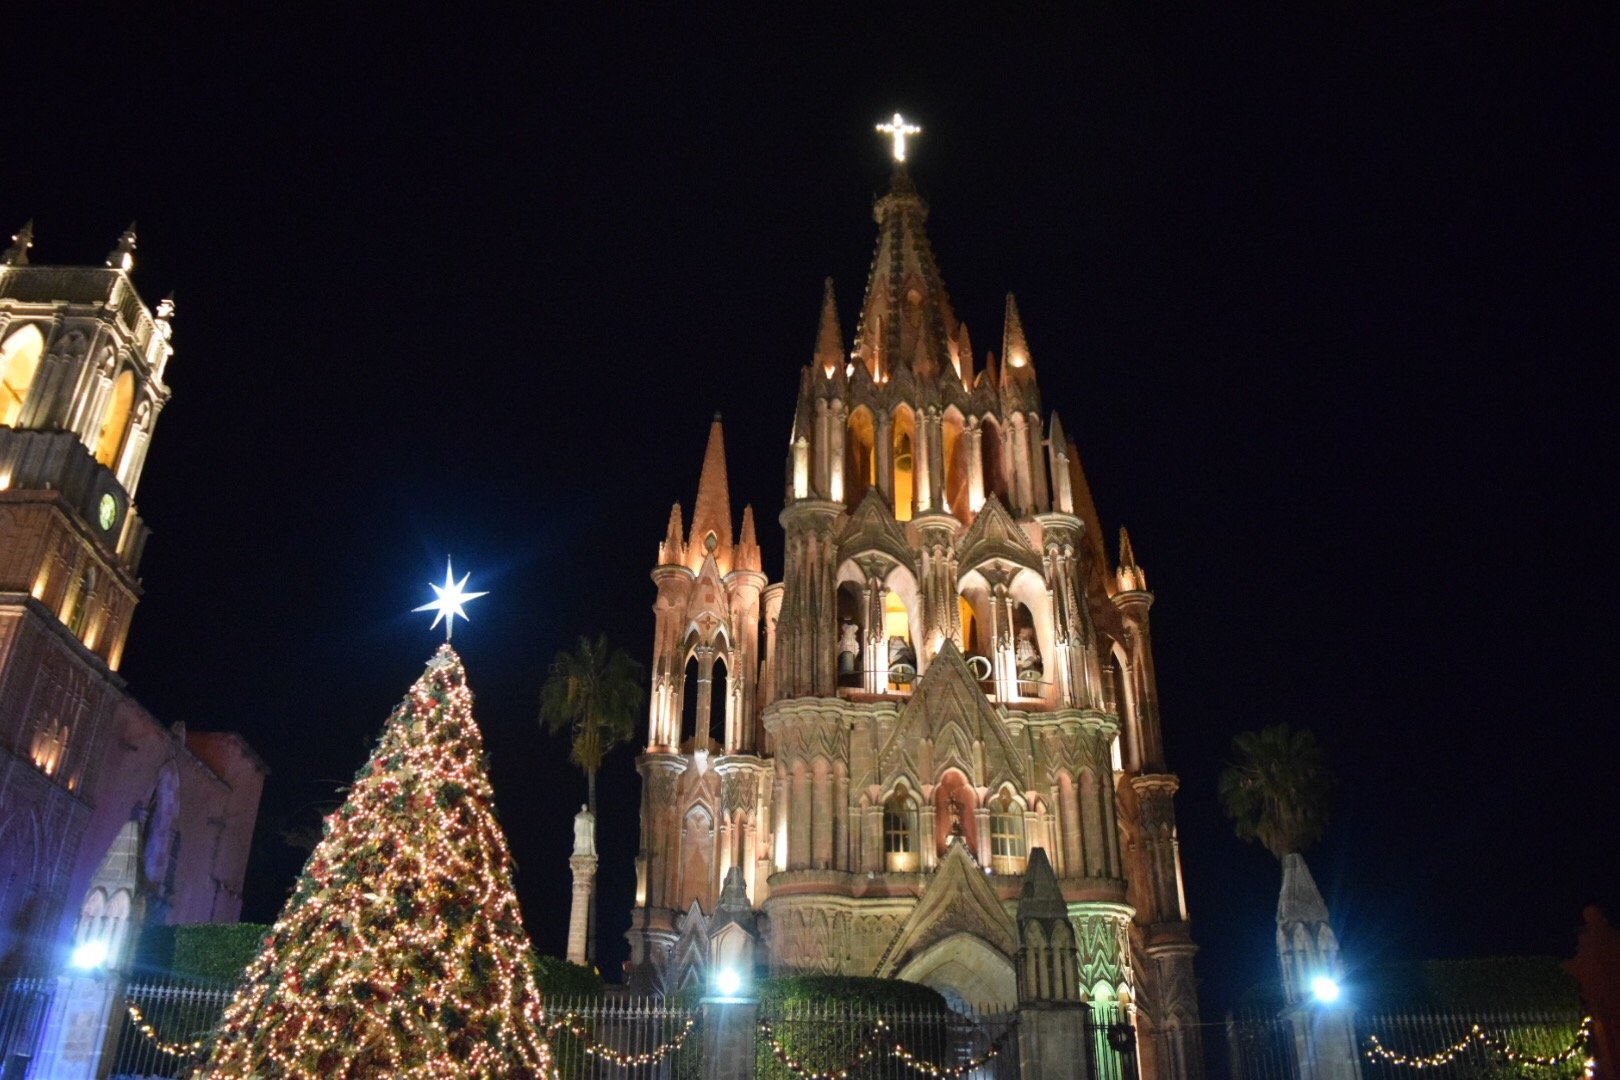 la parroquia church christmas tree lights night time san miguel de allende